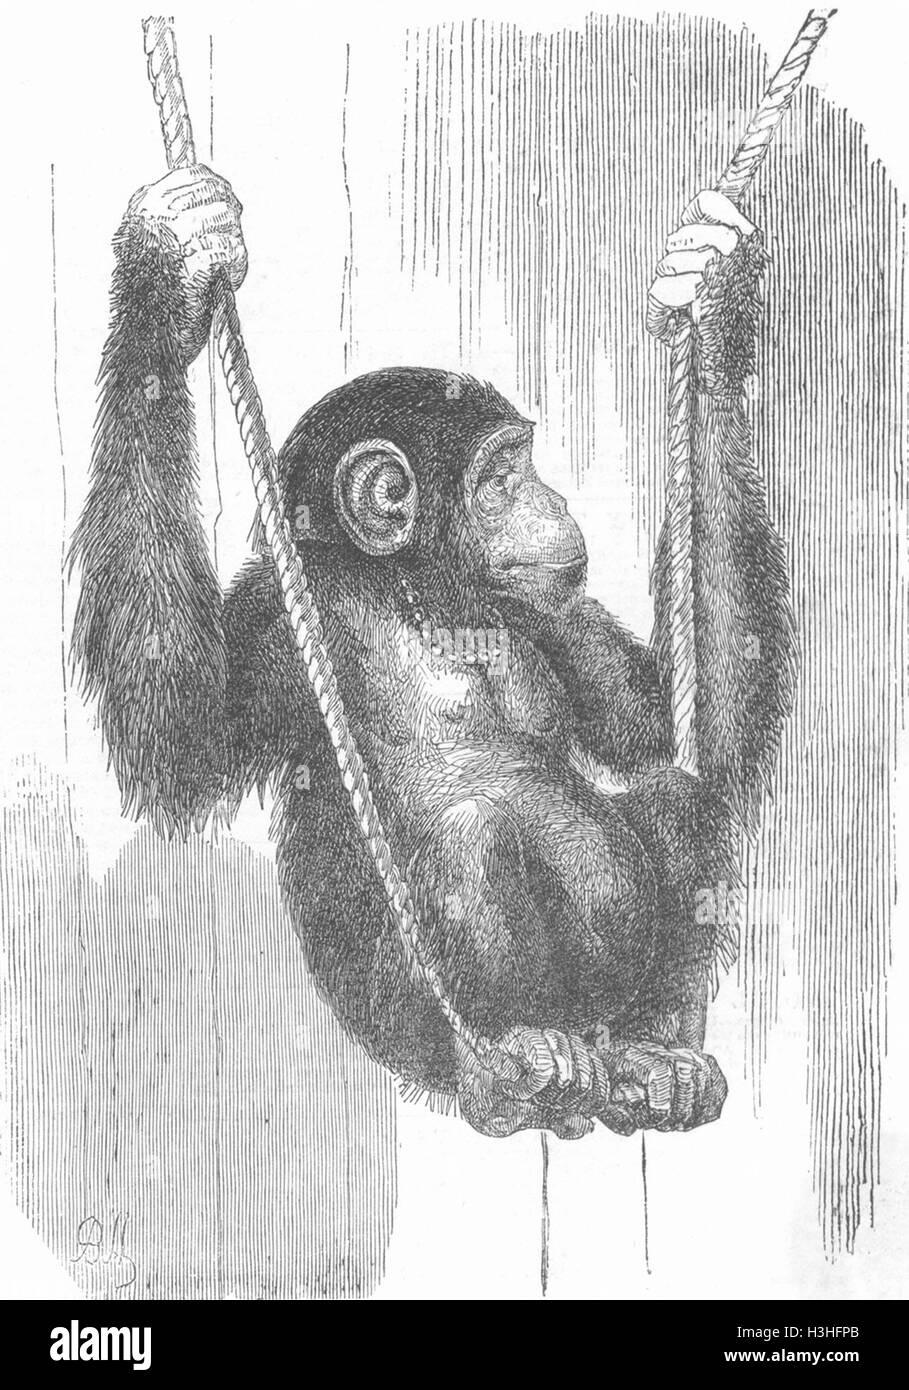 CHIMPS Chimpanzee 1852. Illustrated London News - Stock Image